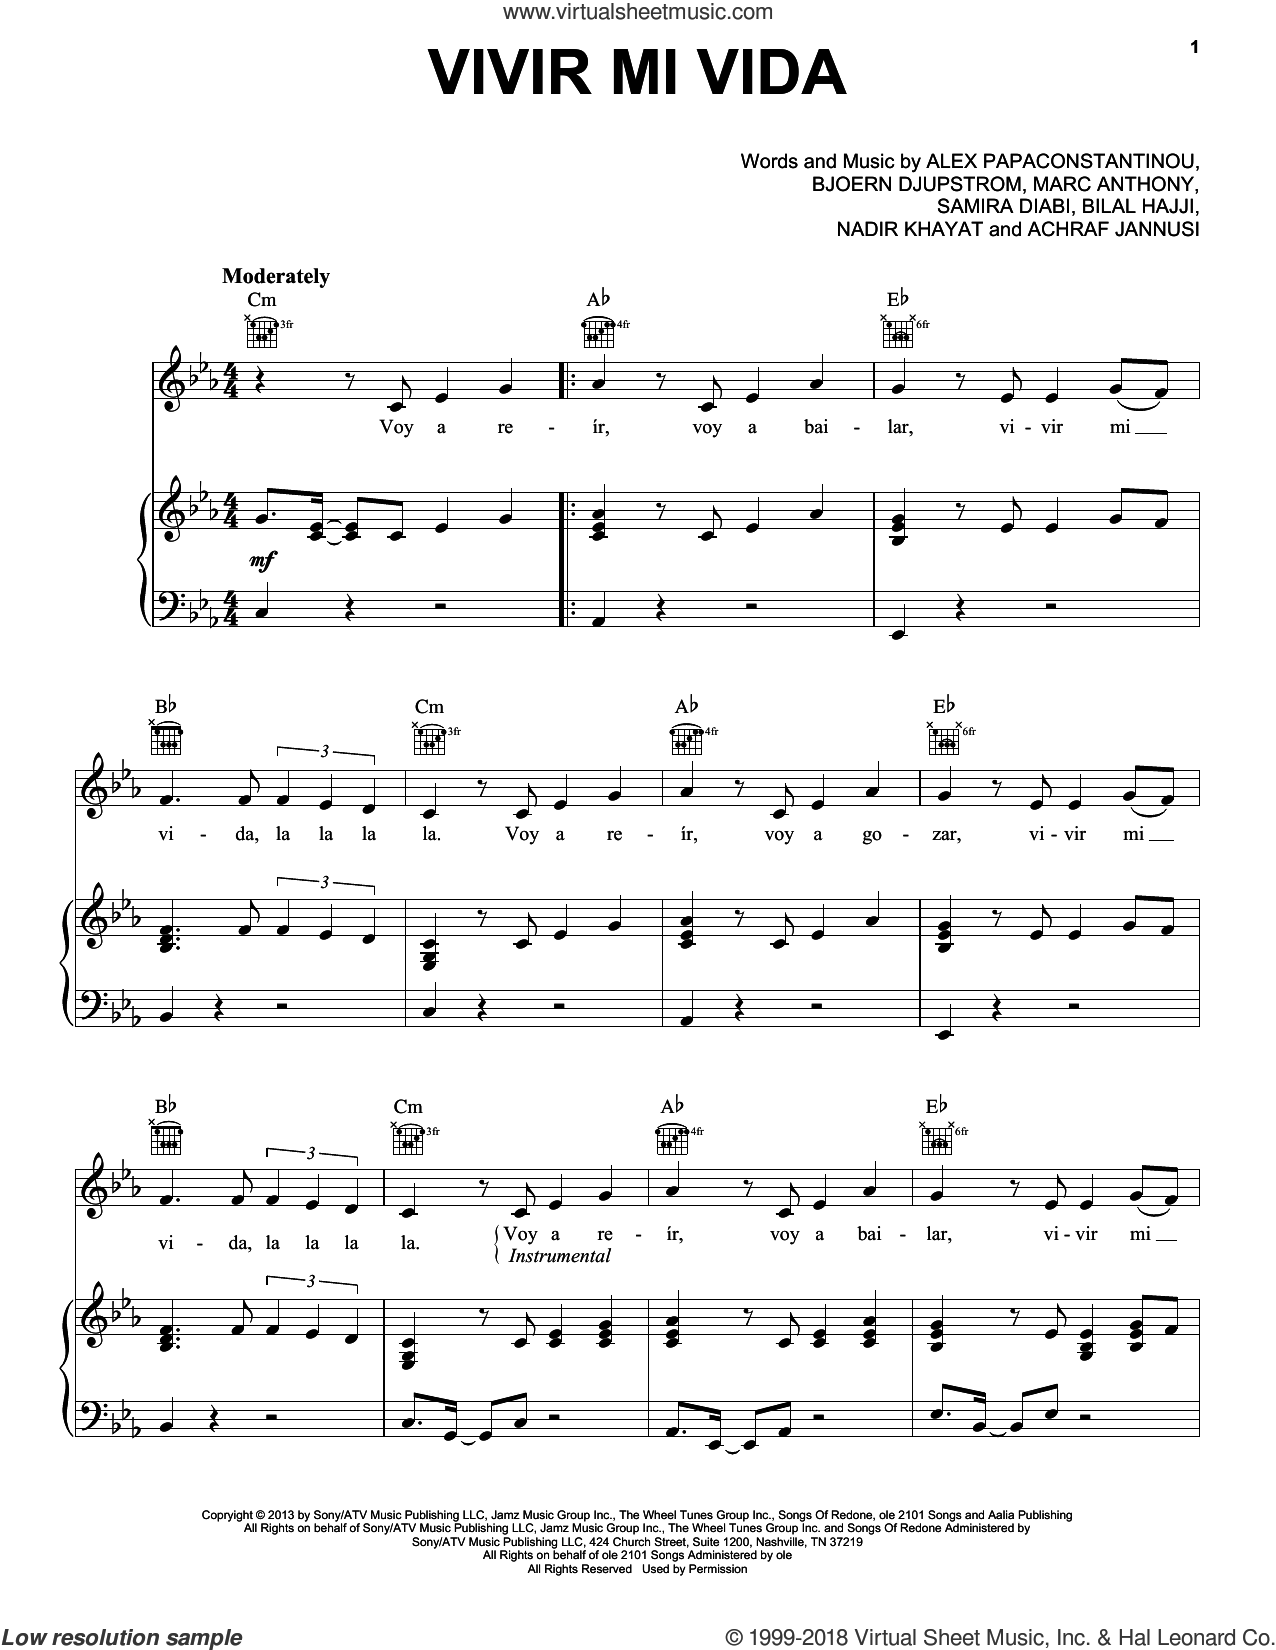 Vivir Mi Vida sheet music for voice, piano or guitar by Marc Anthony, Achraf Jannusi, Alex Papaconstantinou, Bilal Hajji, Bjoern Djupstrom and Samira Diabi, intermediate skill level